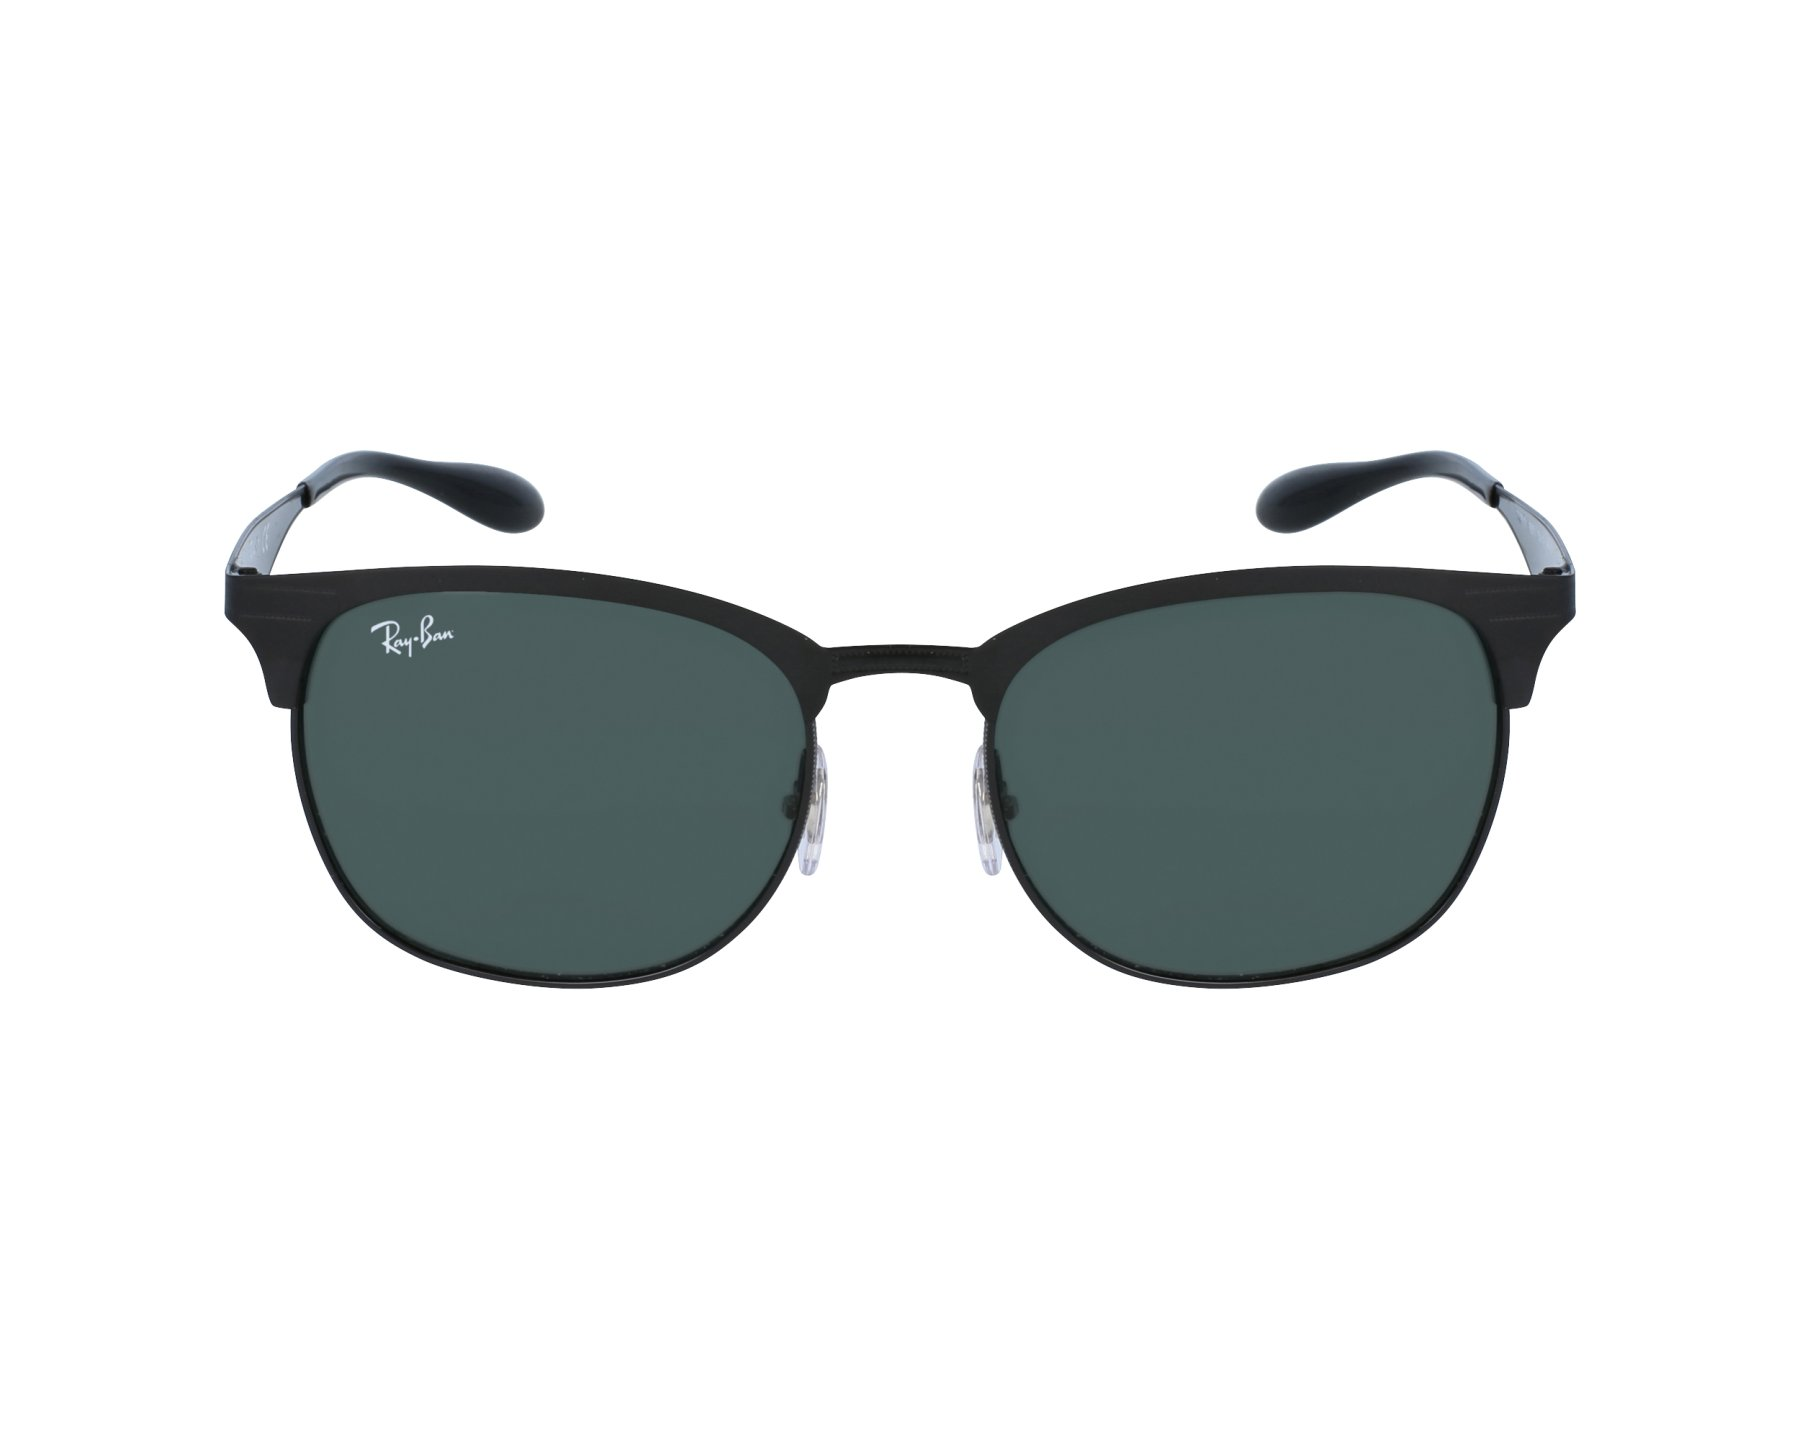 7ee854240e7 Sunglasses Ray-Ban RB-3538 186 71 53-19 Black Black profile